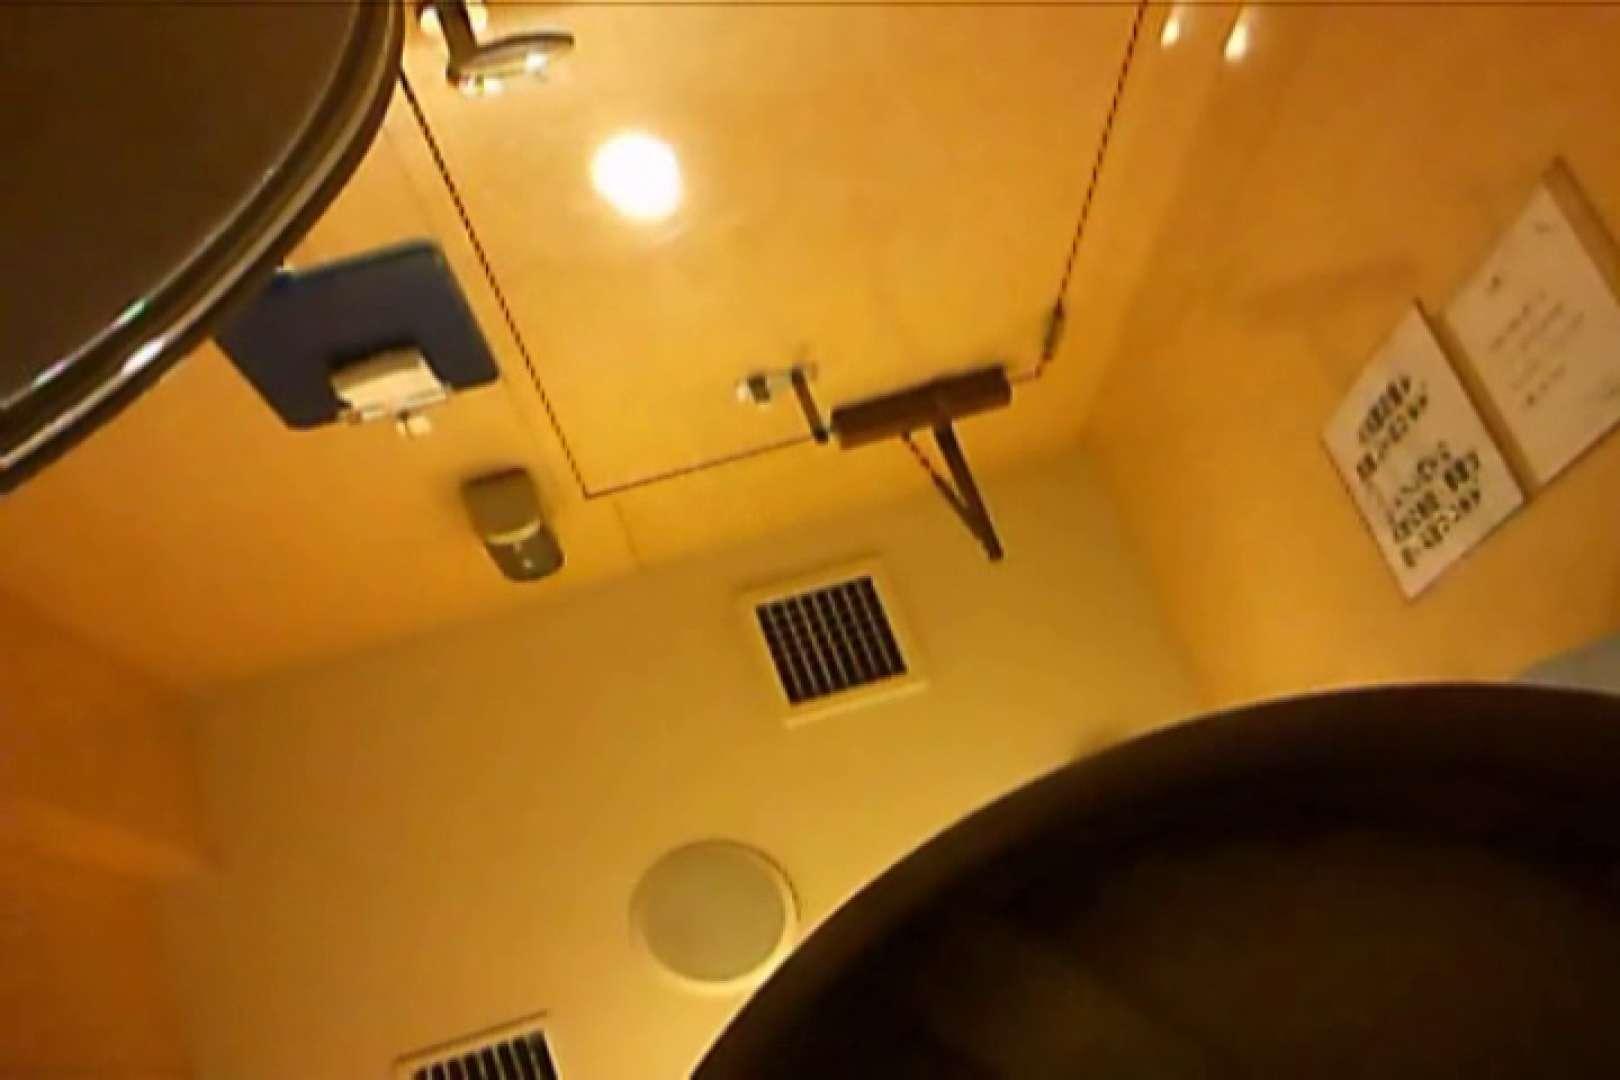 SEASON 2ND!掴み取りさんの洗面所覗き!in新幹線!VOL.13 リーマン系ボーイズ | 人気シリーズ  80pic 22